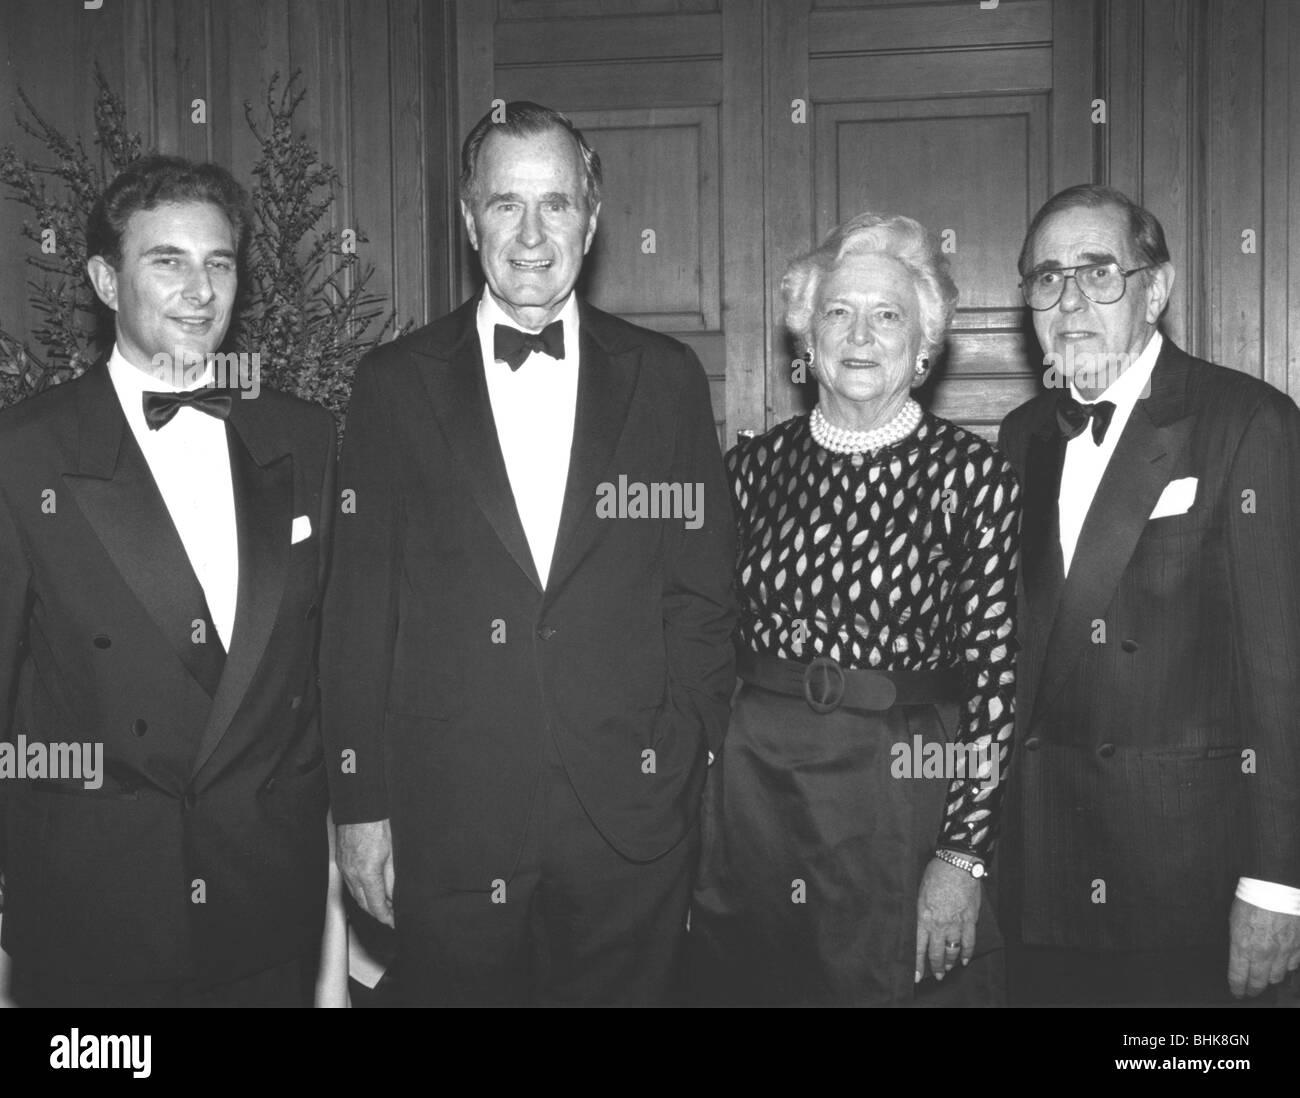 George Bush Senior at Jewish dinner, 1993. Artist: Sidney Harris - Stock Image